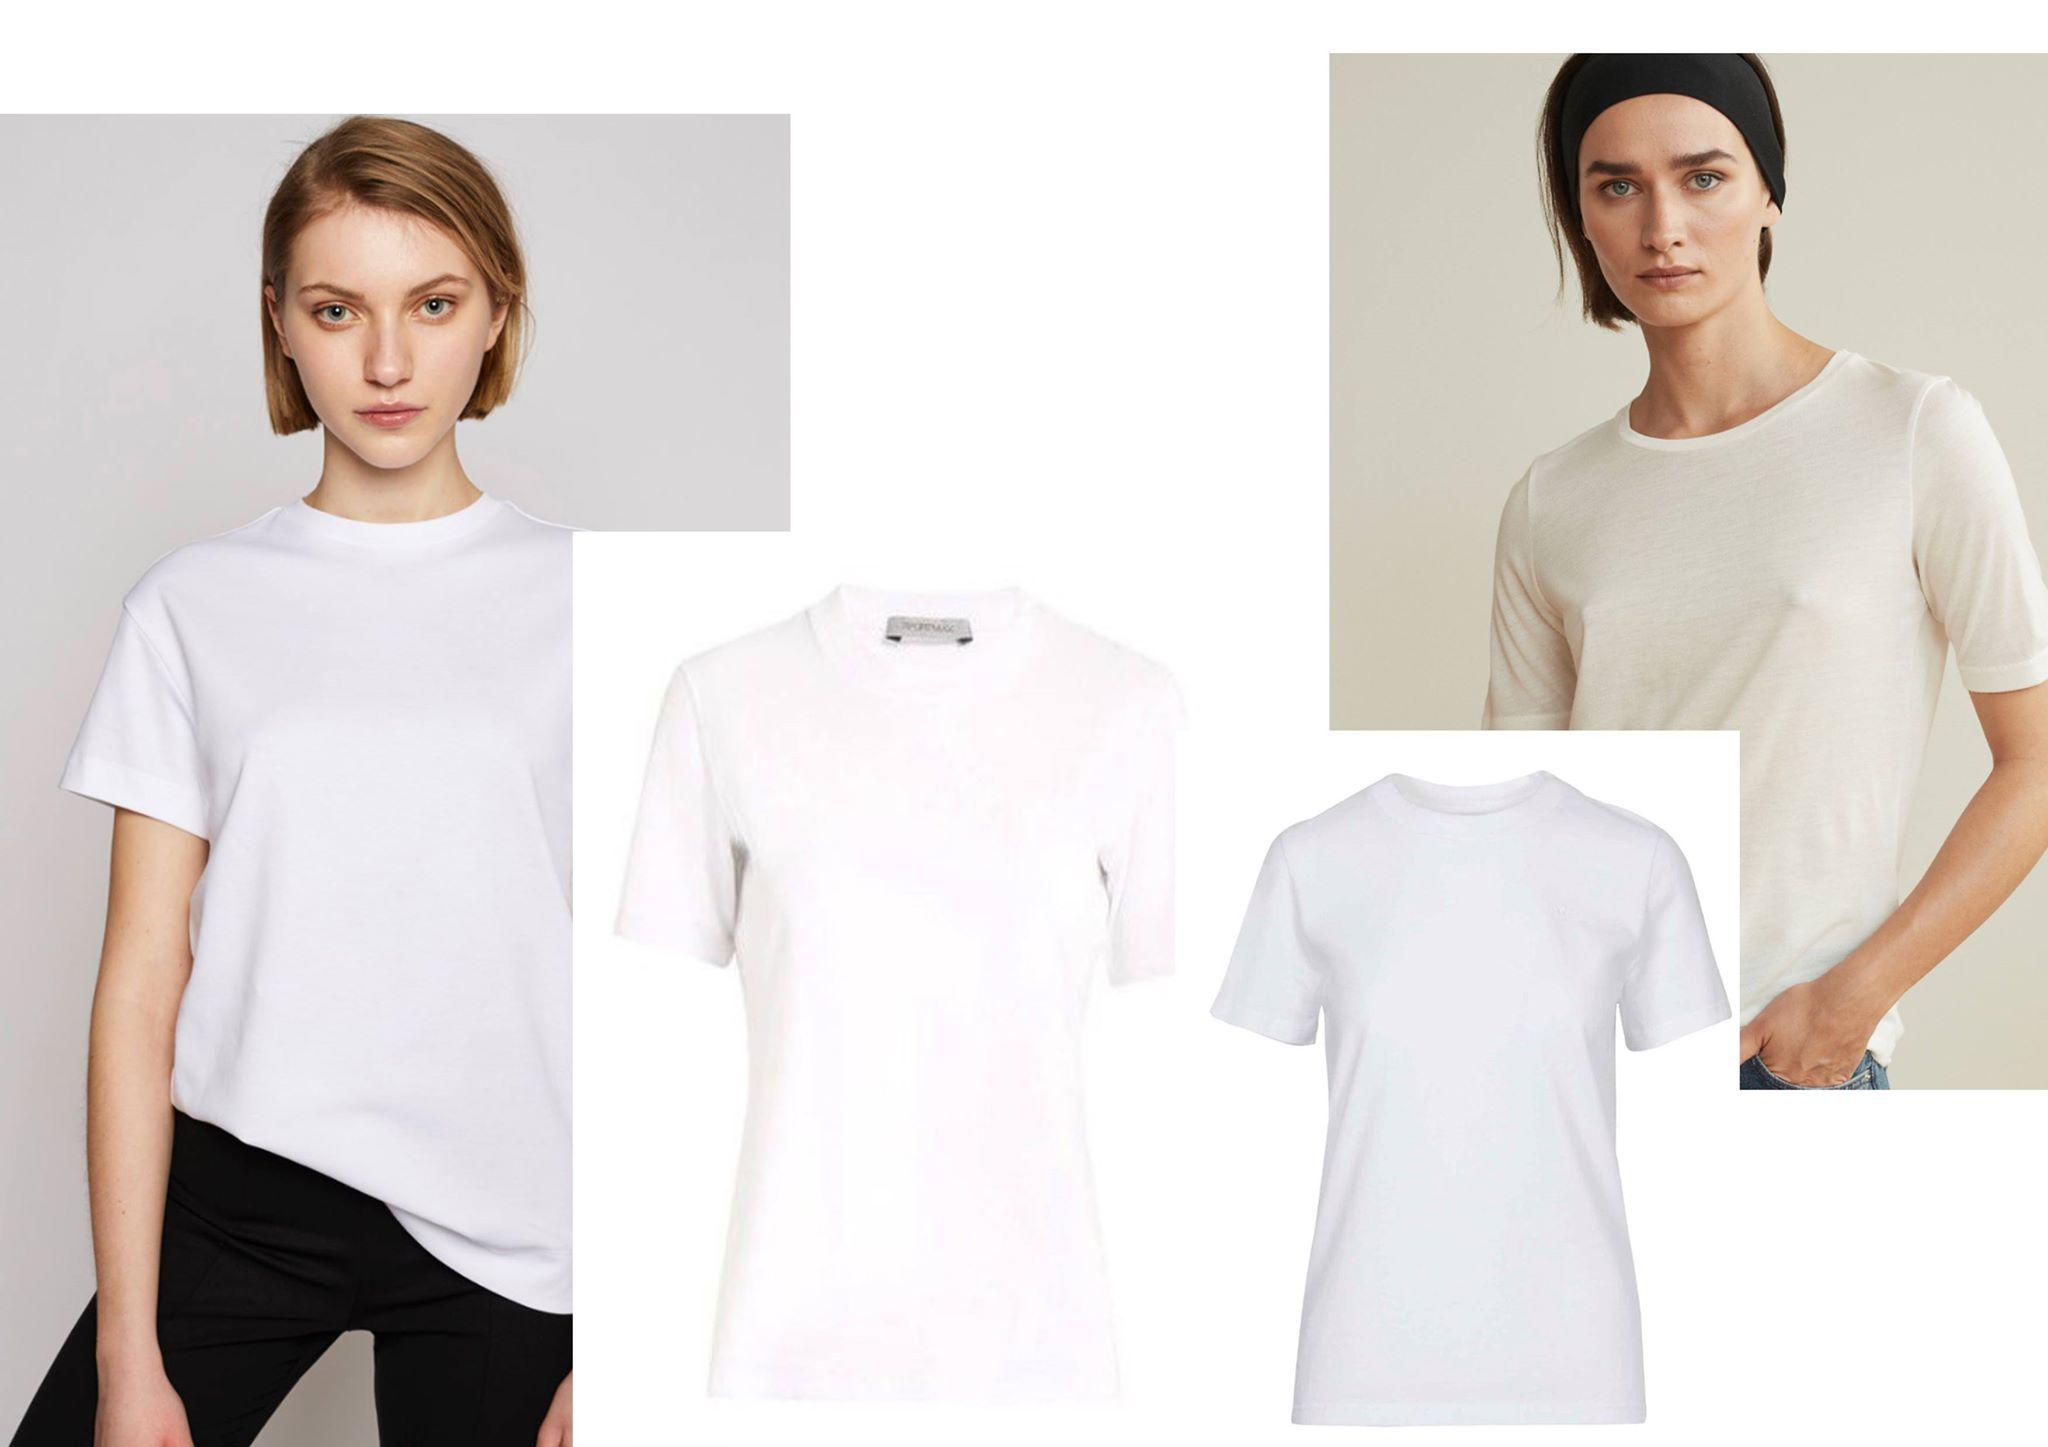 t-skjorte luksus